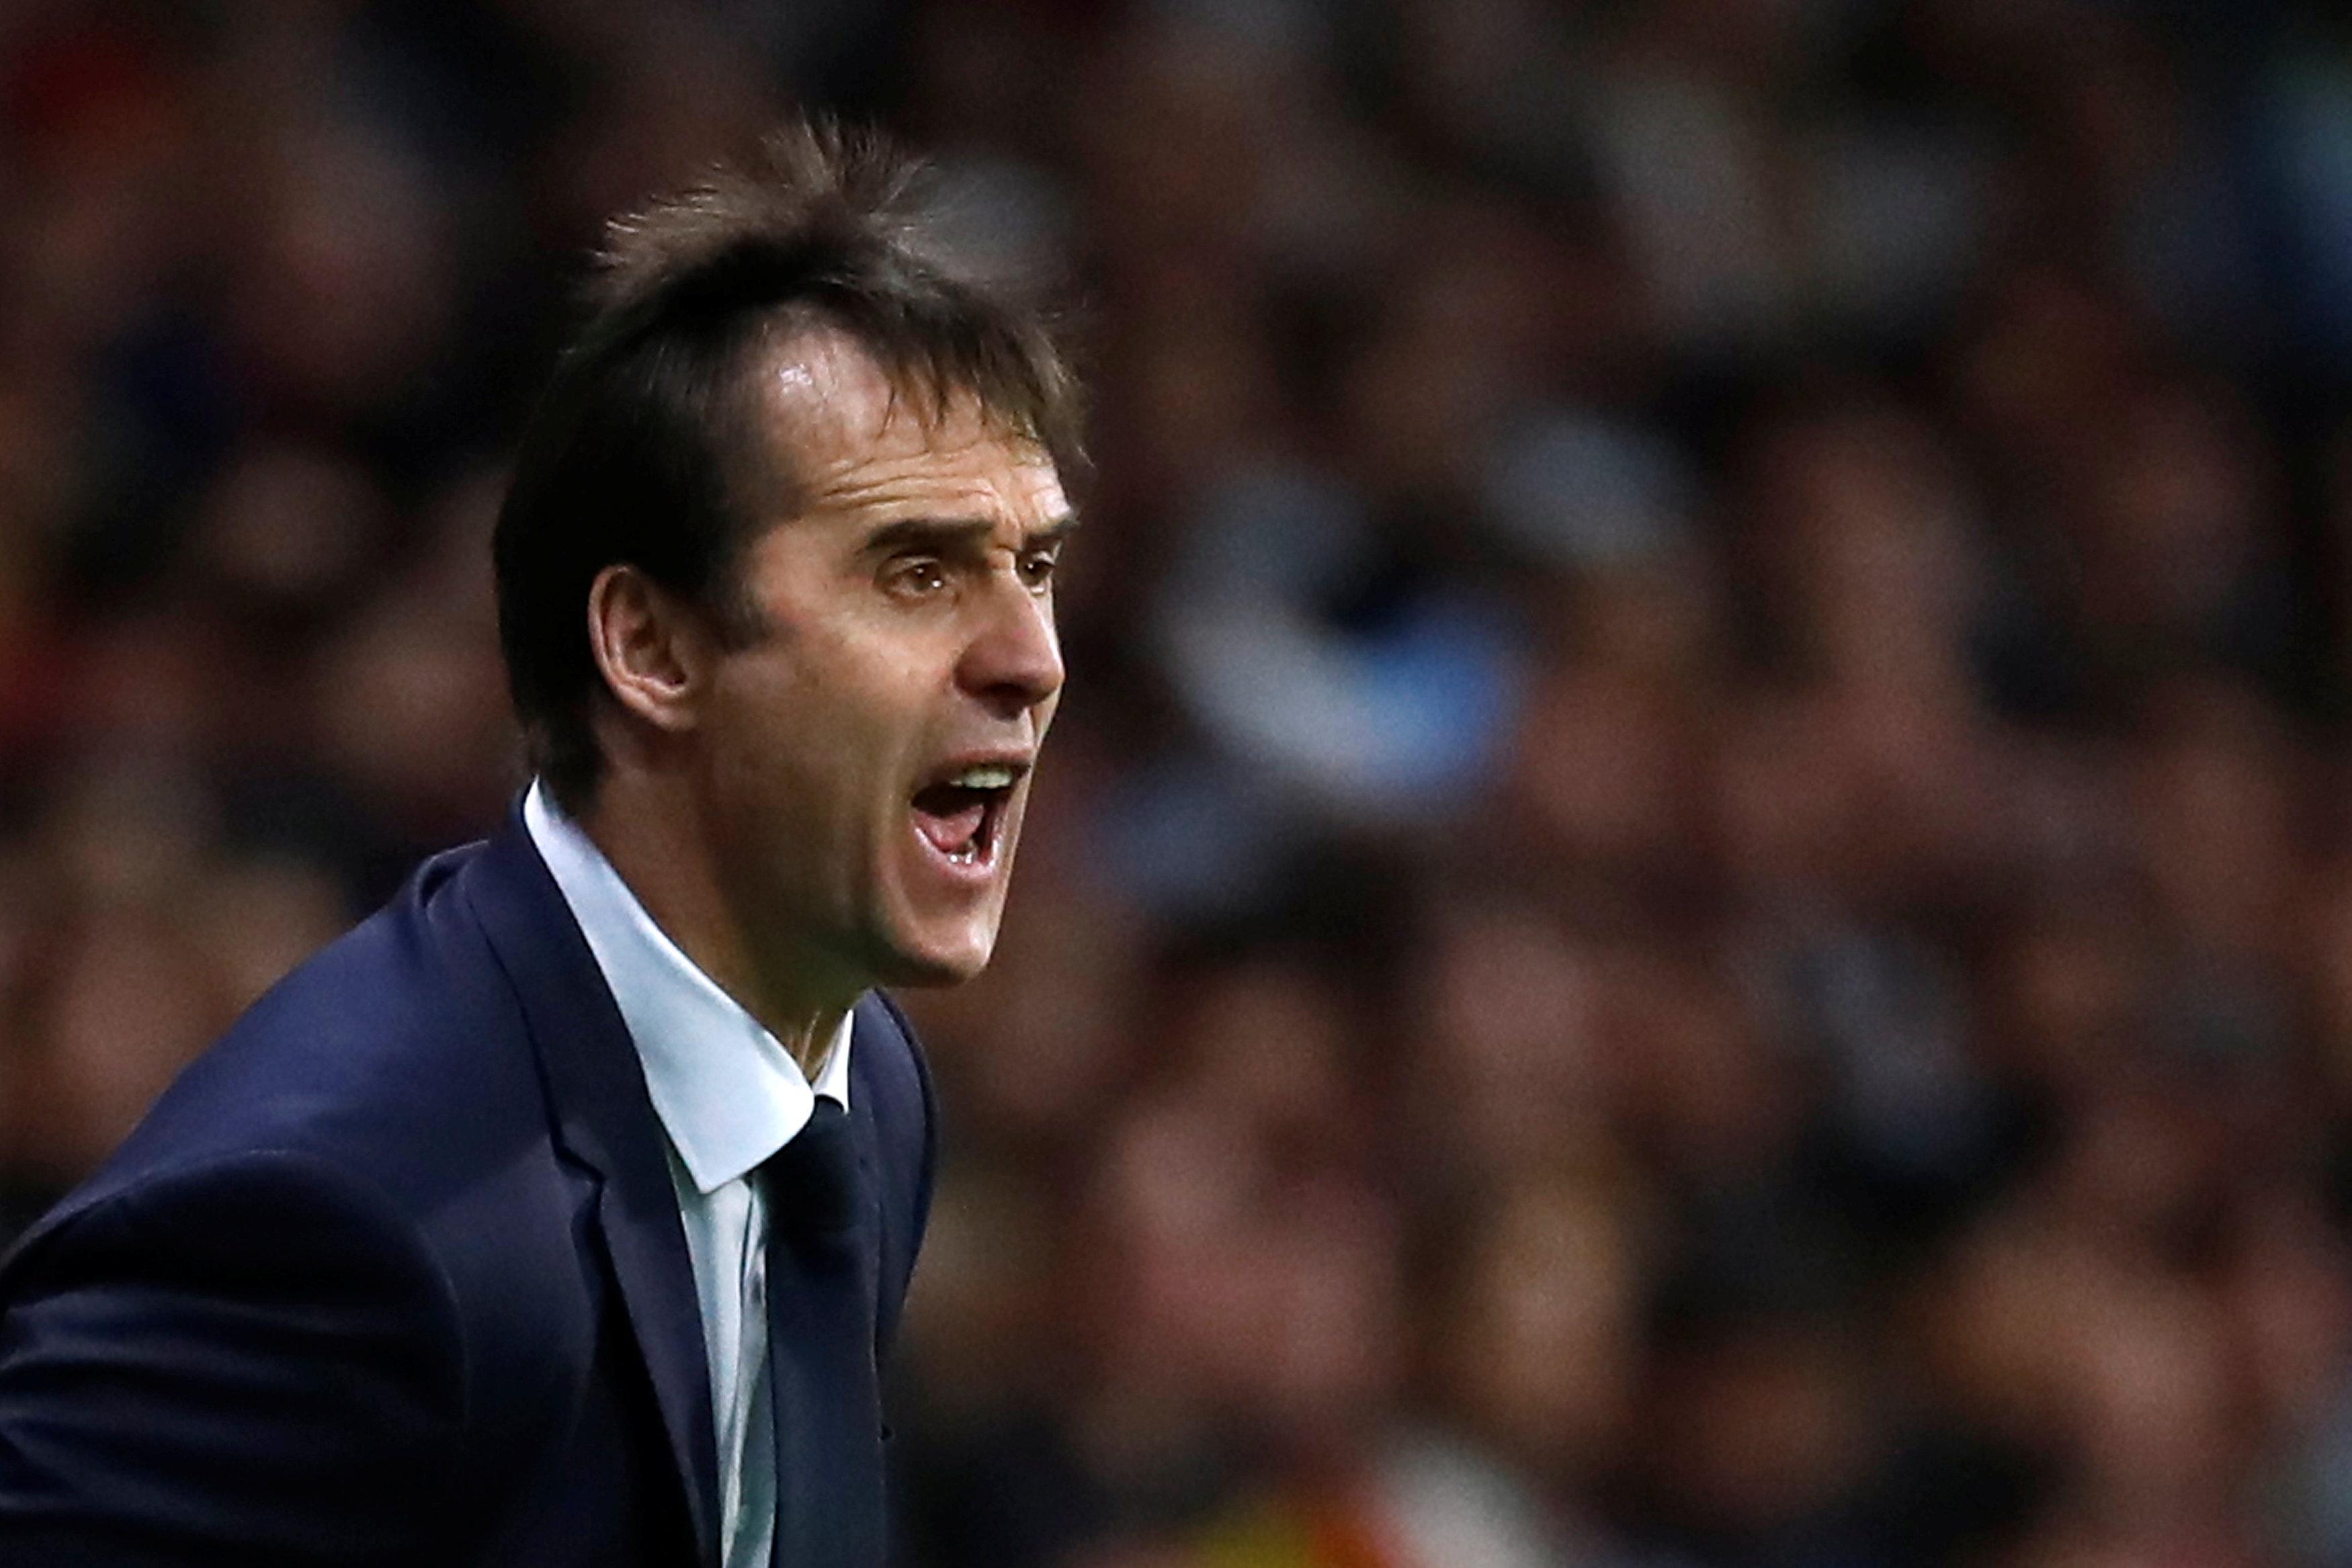 Soccer Football - International Friendly - Spain vs Argentina - Wanda Metropolitano, Madrid, Spain - March 27, 2018   Spain coach Julen Lopetegui    REUTERS/Juan Medina